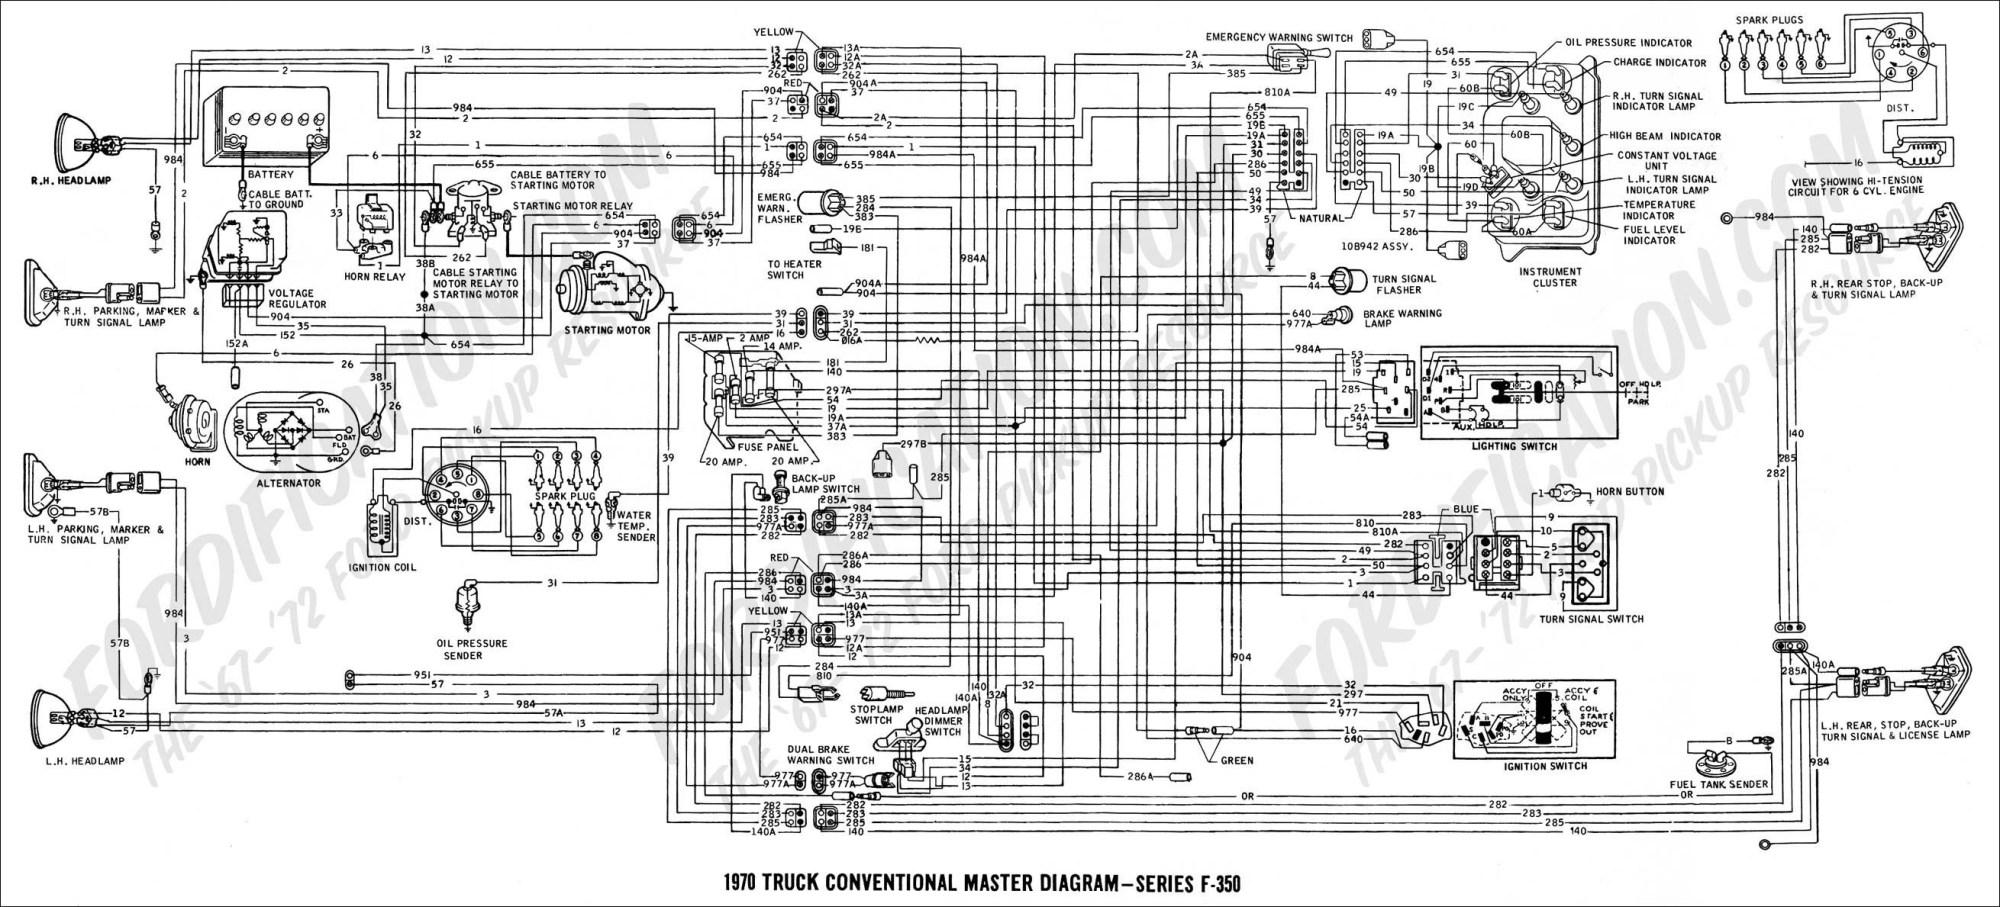 hight resolution of 2000 f250 headlight switch wiring diagram 2000 ford f 250 headlight wiring diagram gallery 1c